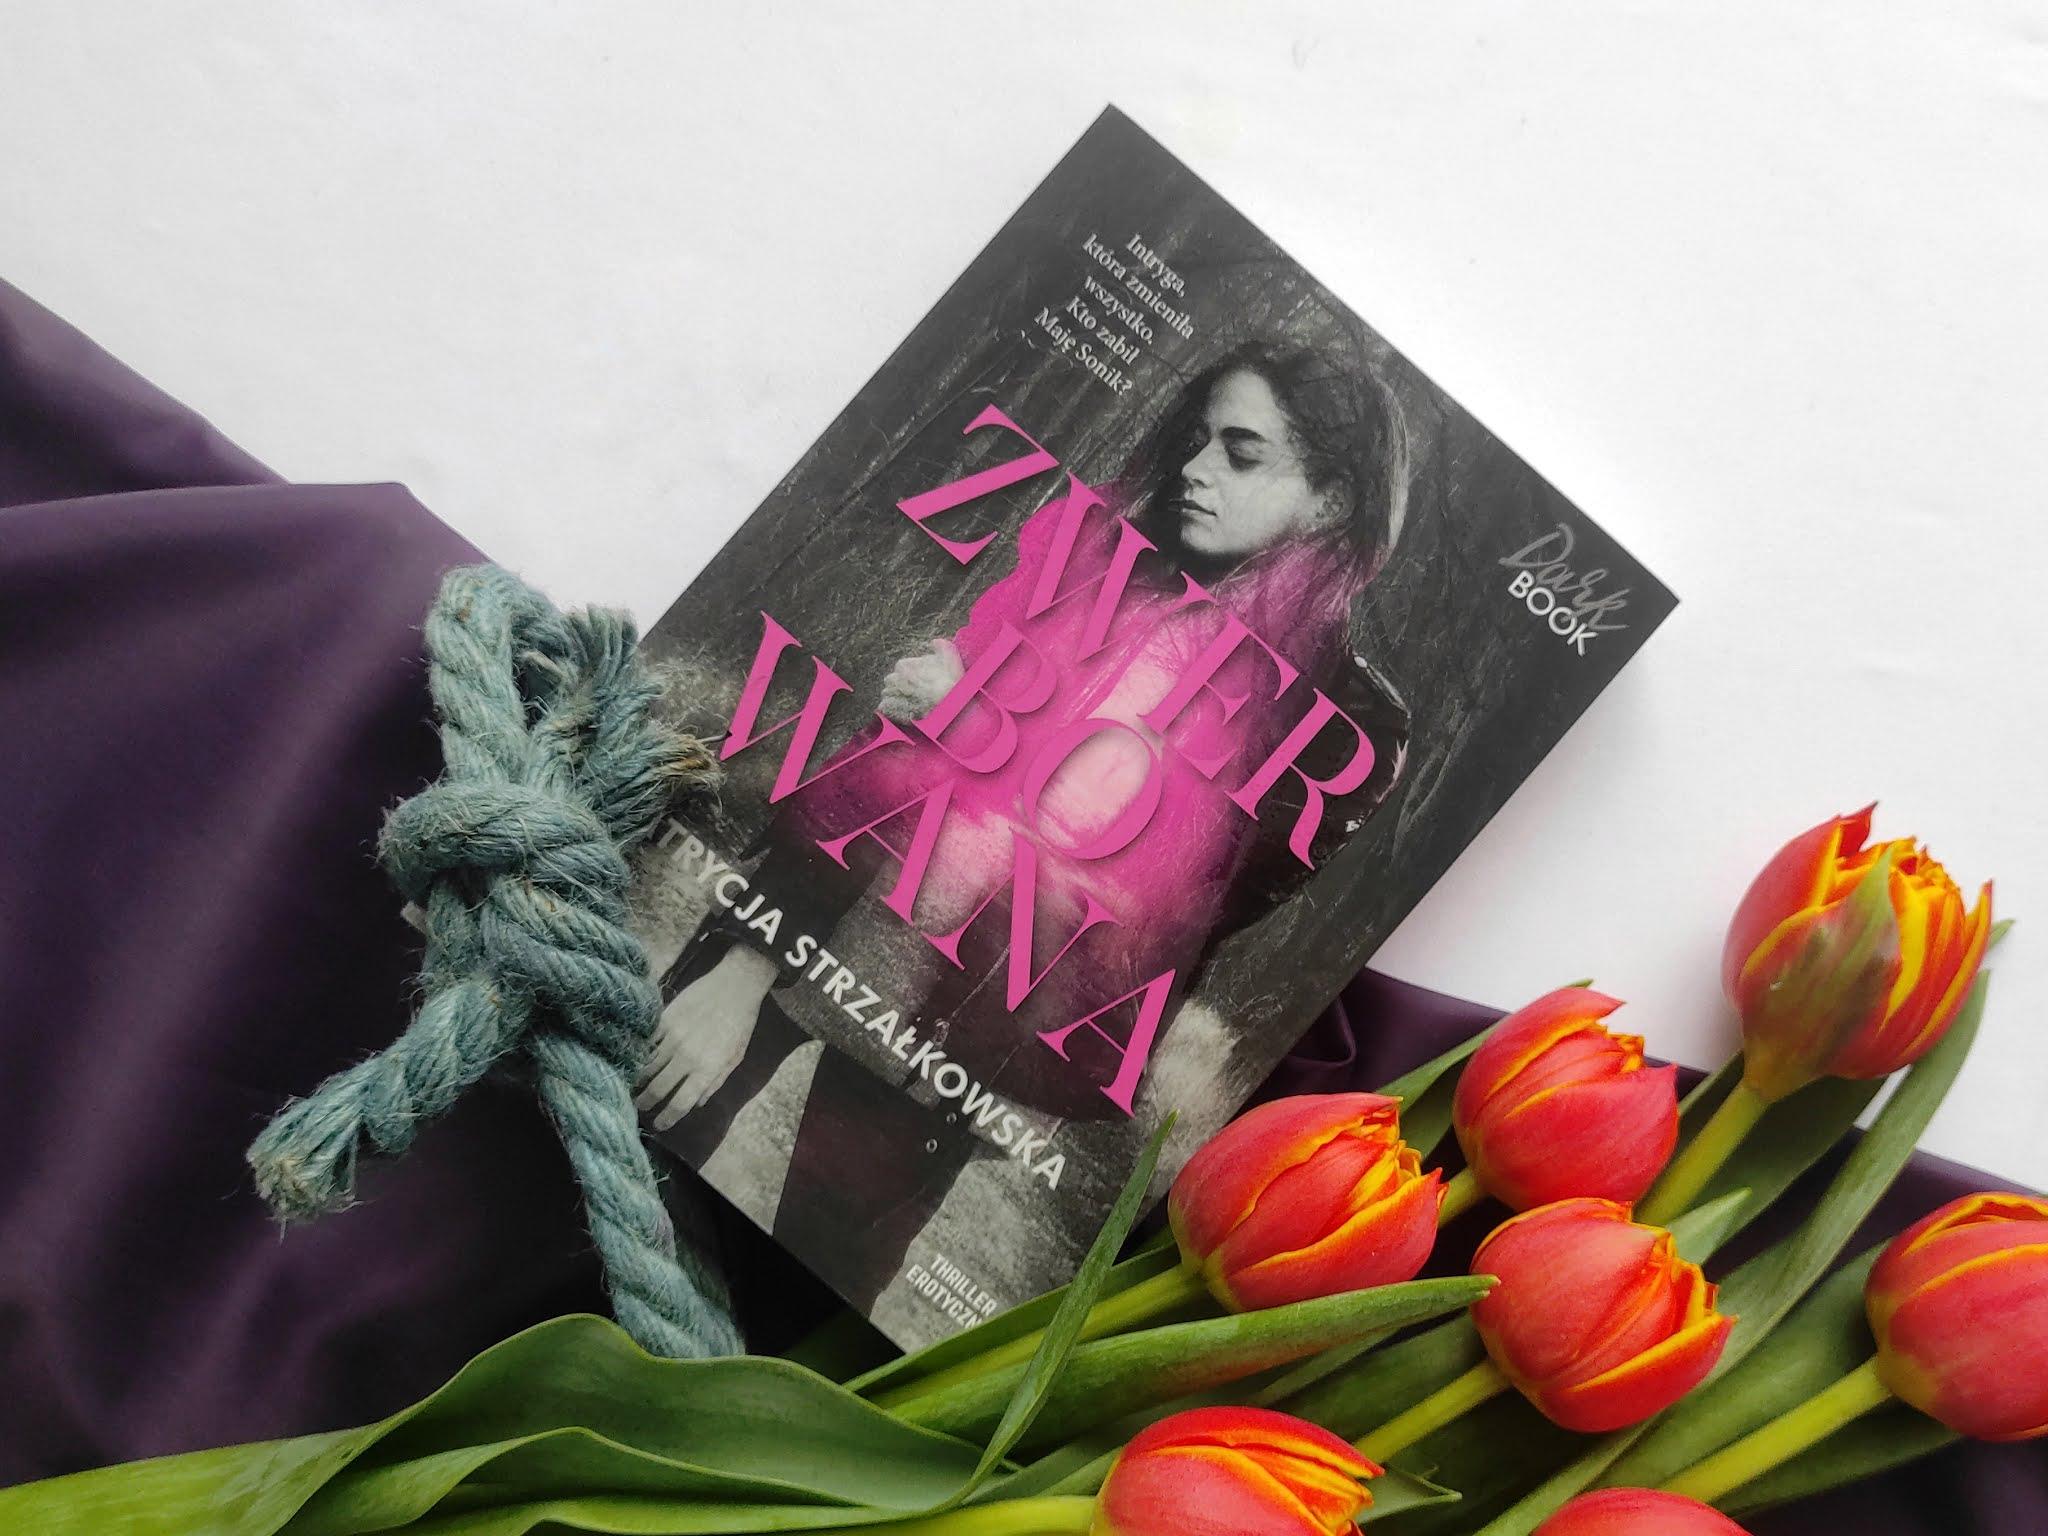 Dark Book Zwerbowana